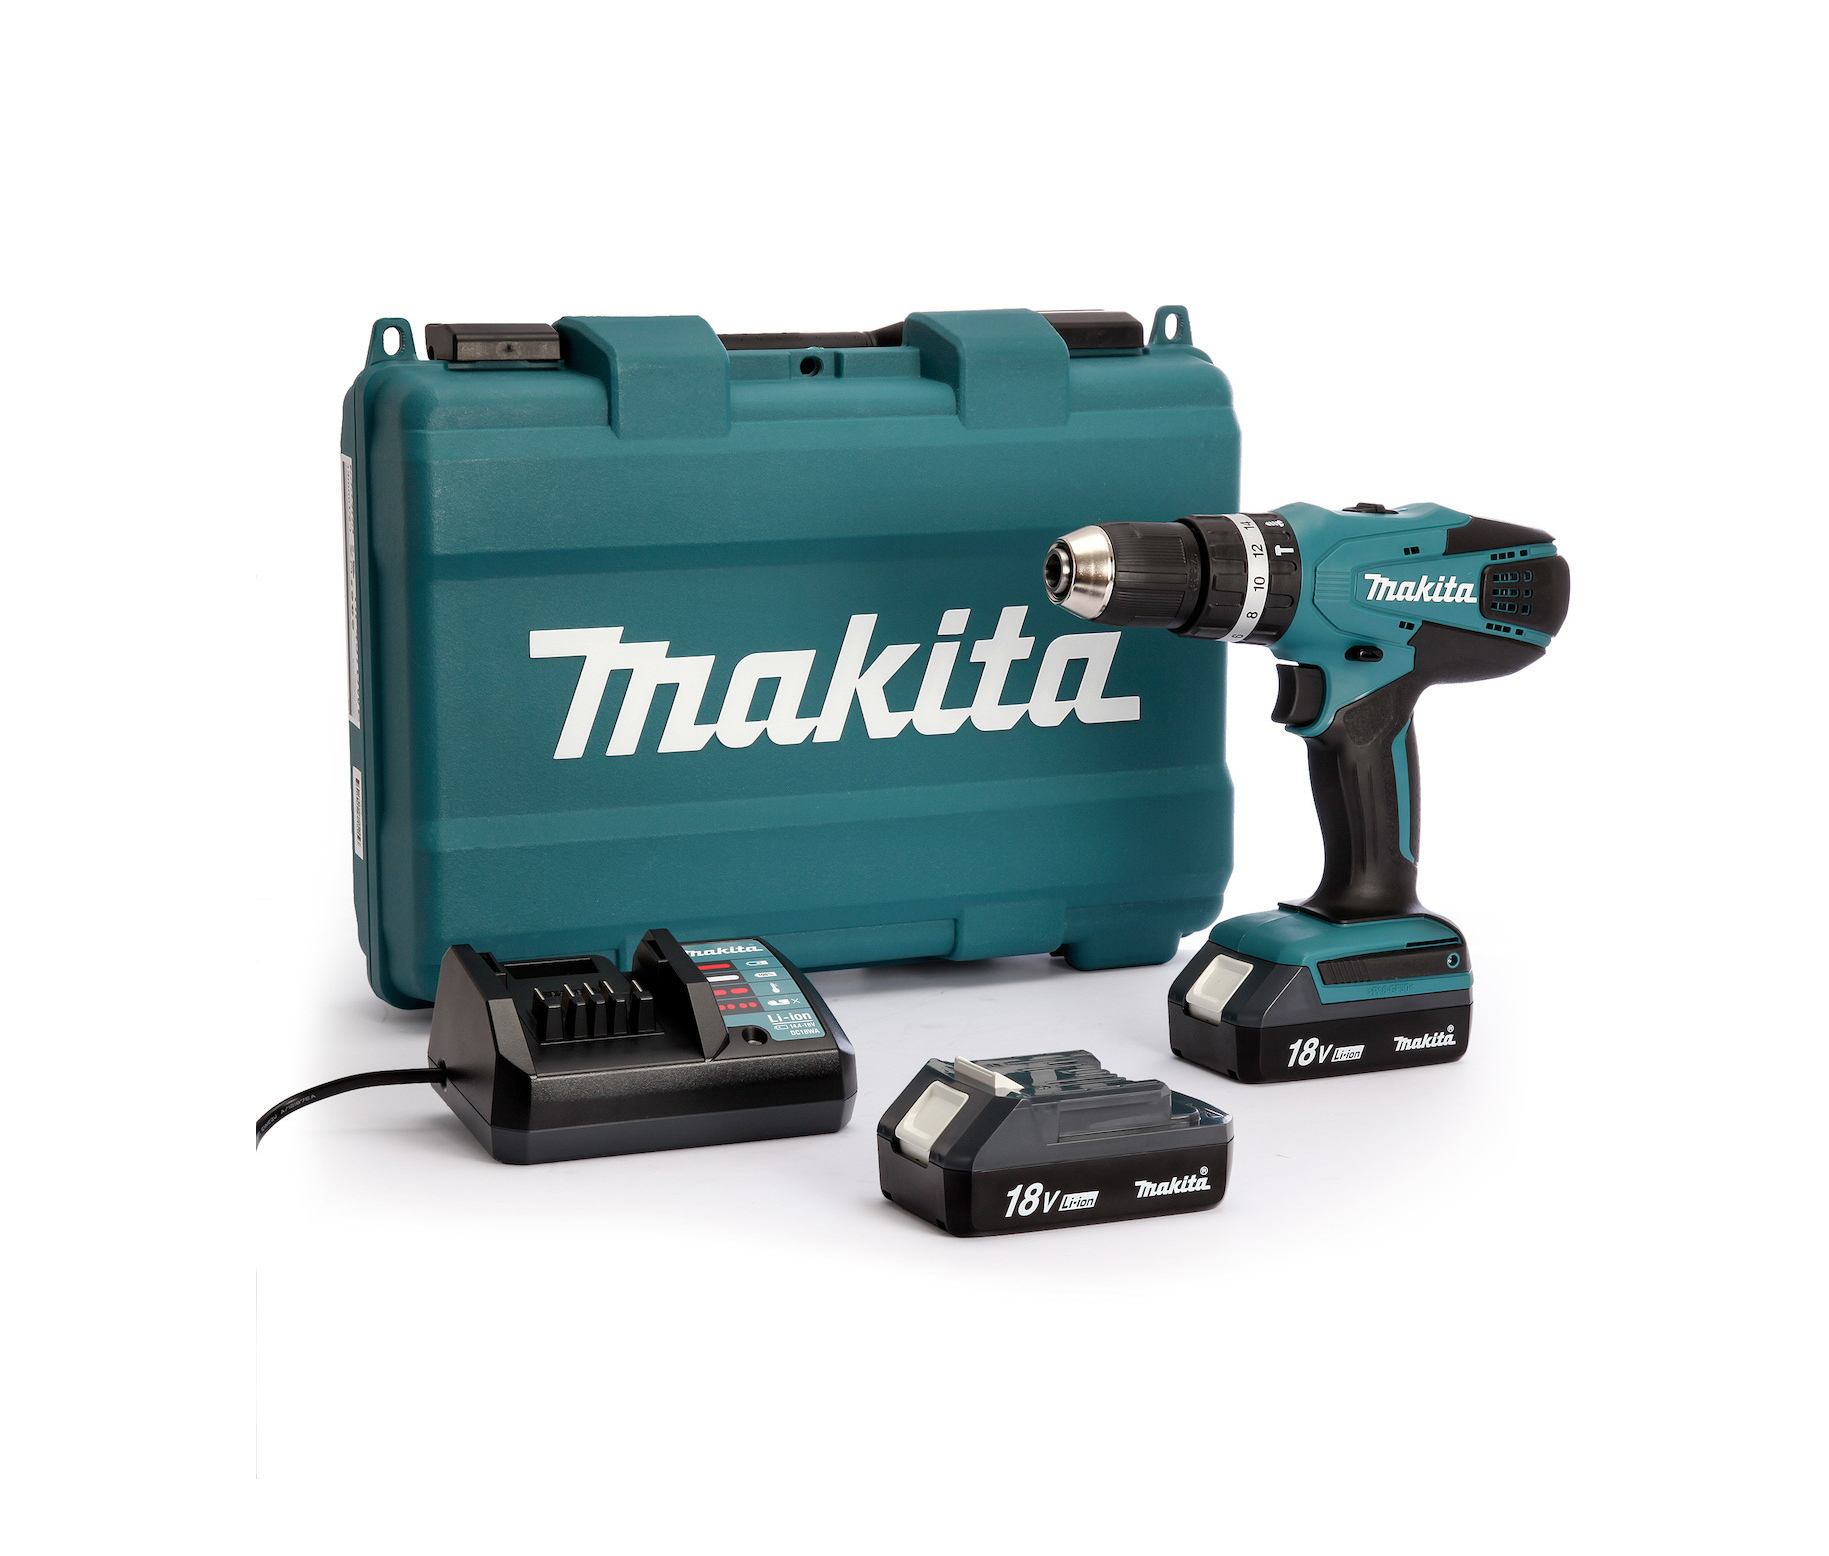 Makita HP457DWE 18V 1x1.5Ah Δραπανοκατσάβιδο Πληρωμή έως 24 δόσεις